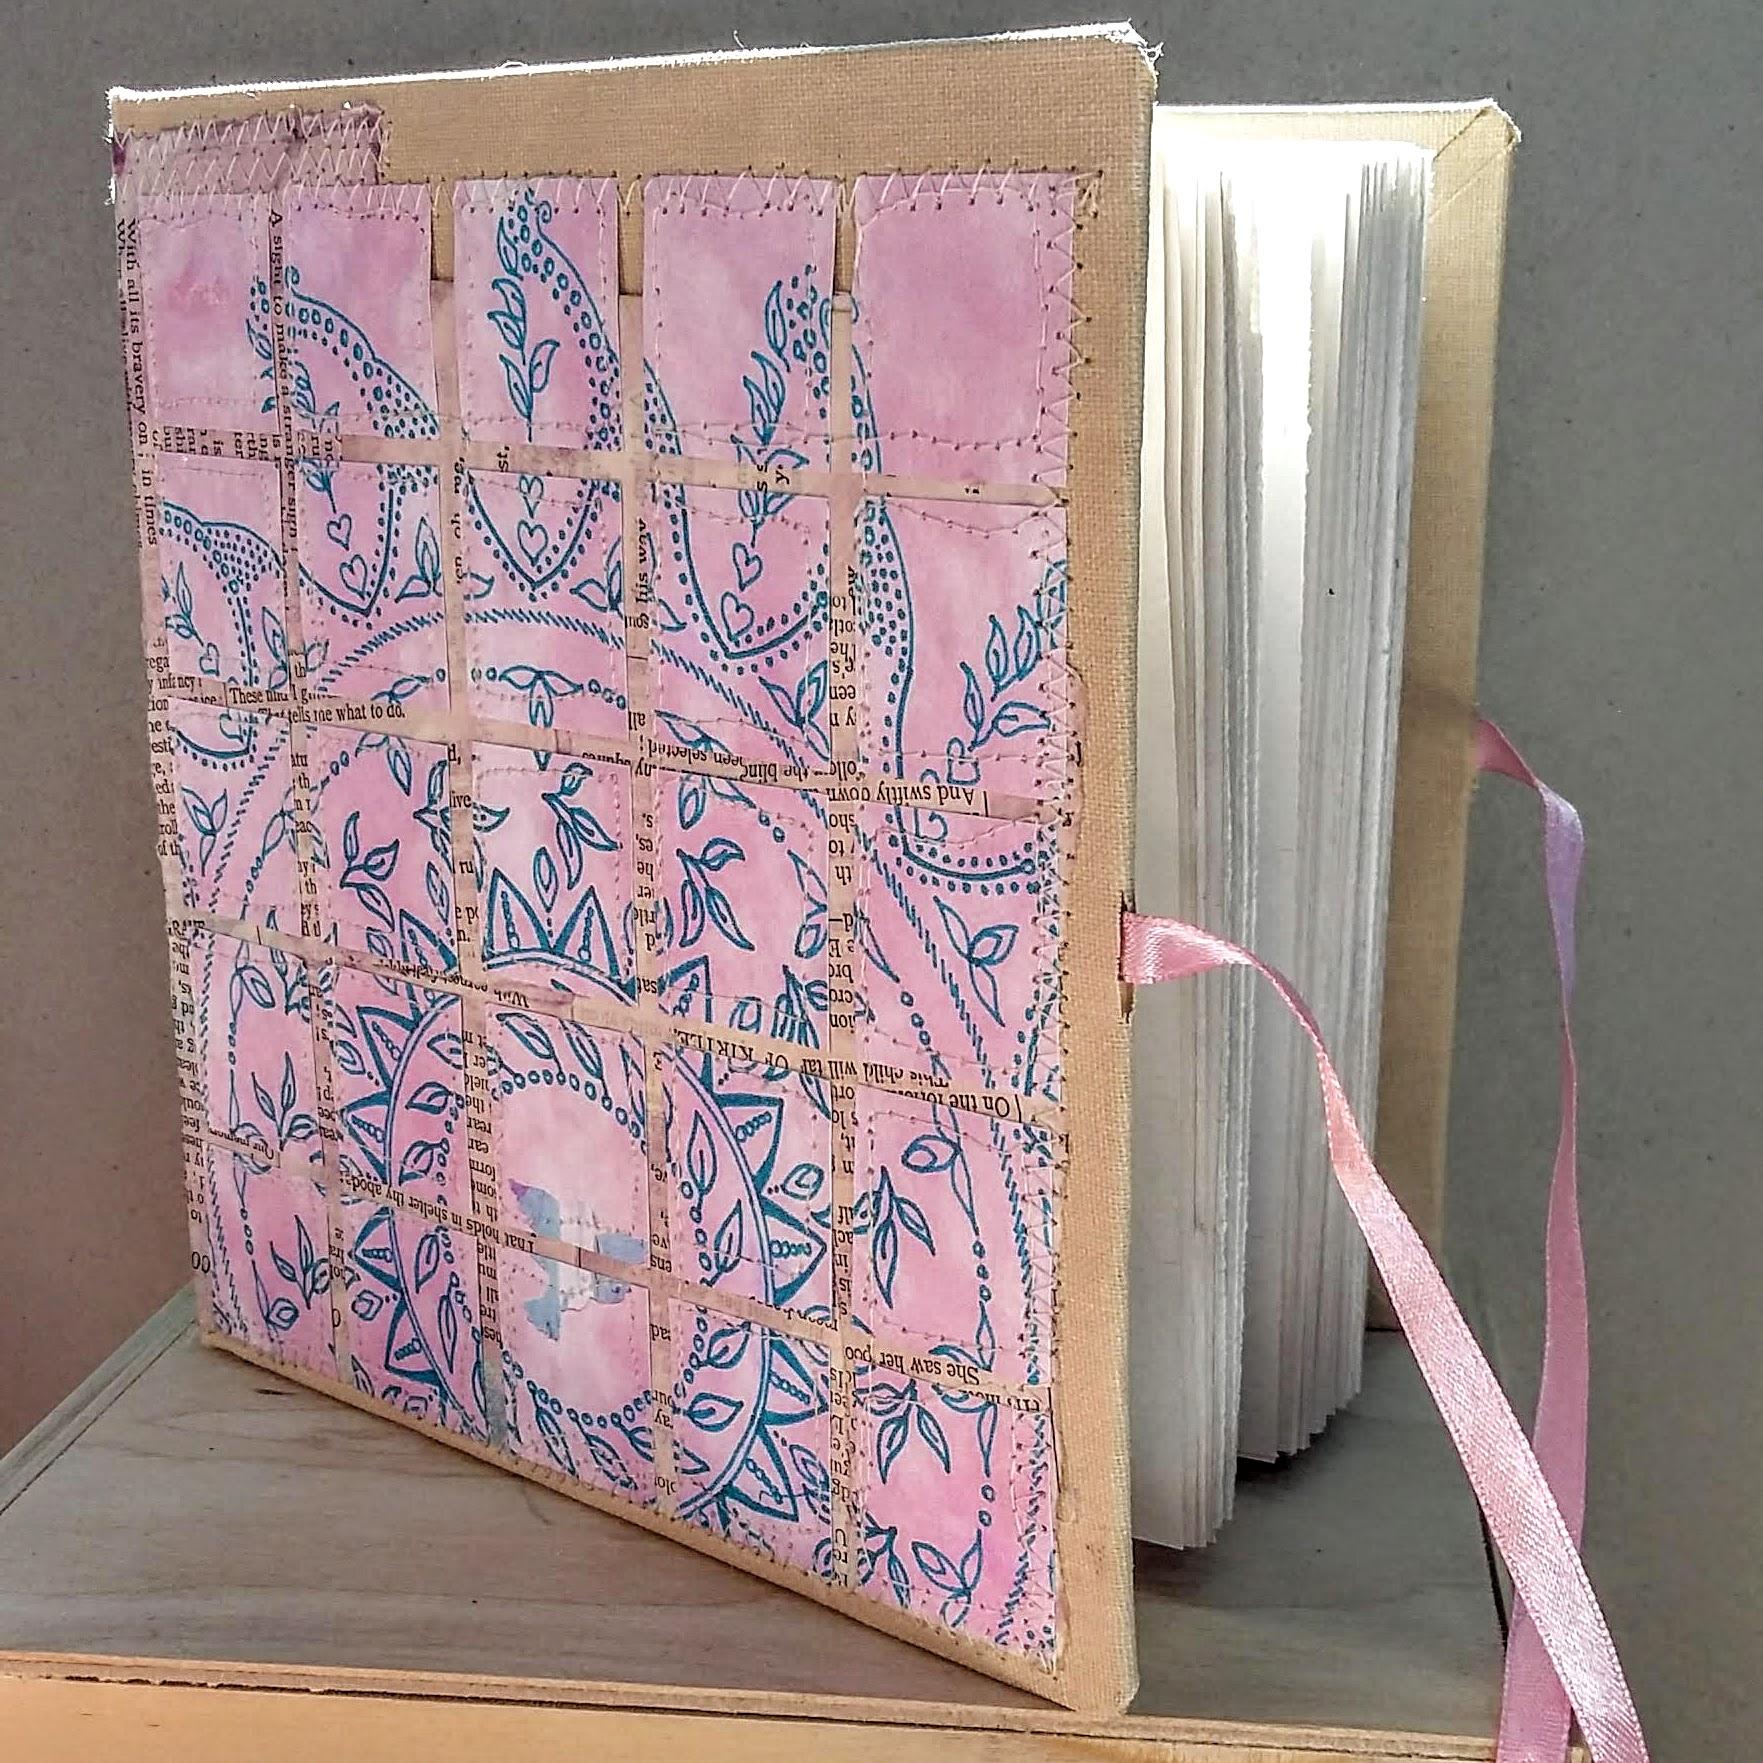 Squared mandala book. 15.5 x 15 cm. 140 sides, 70 pages. £55 plus p&p